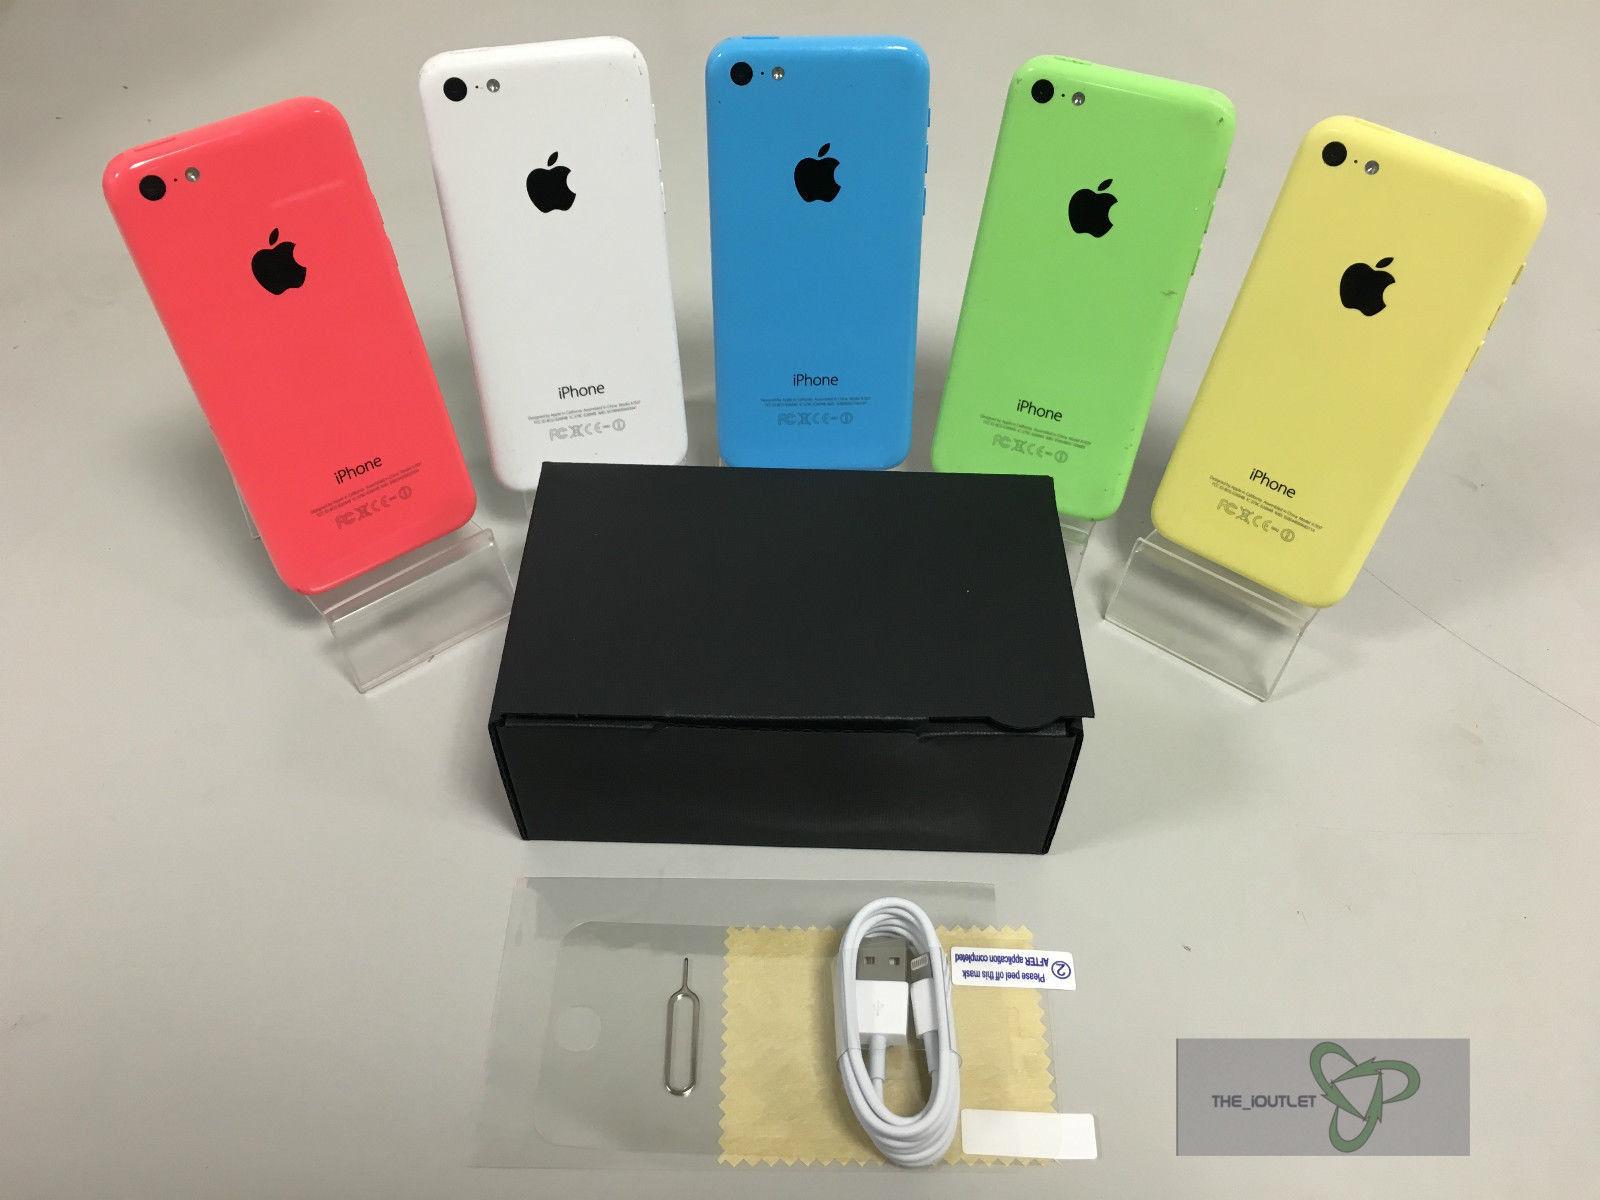 Apple iPhone 5c - 8GB - Unlocked- GOOD CONDITION